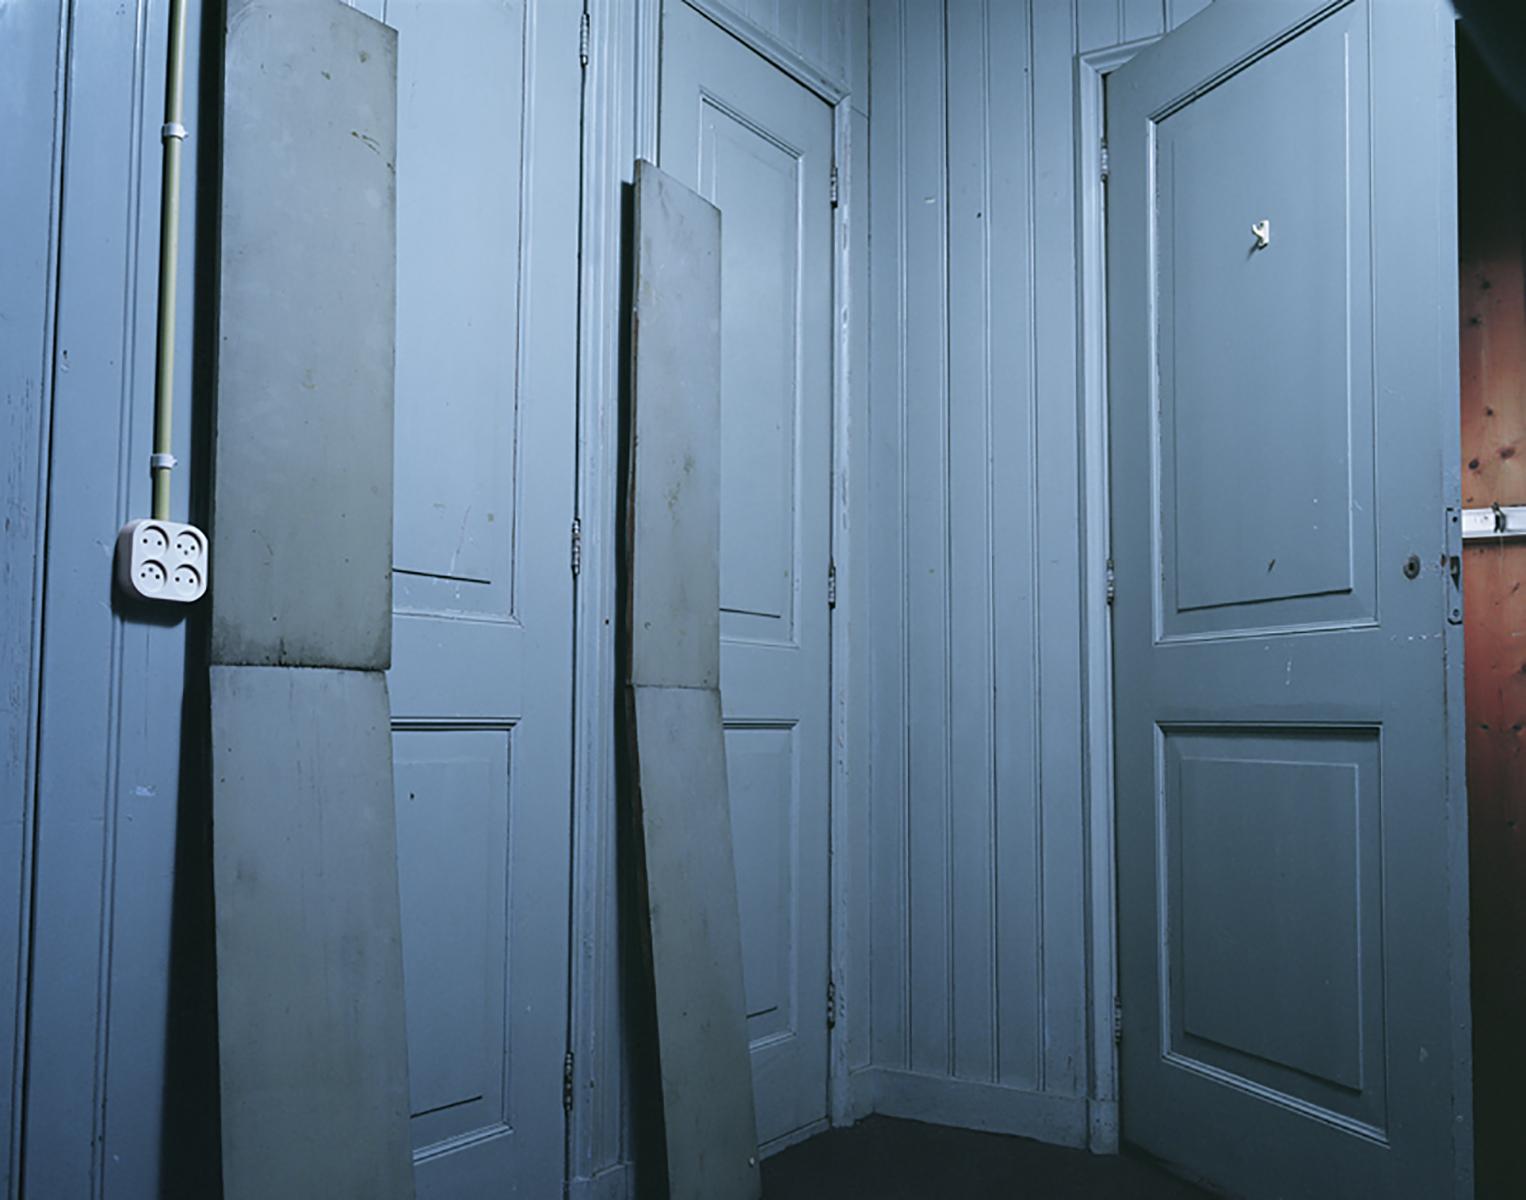 Closing Rooms #3 photograph c print on dibond 100-125 cm